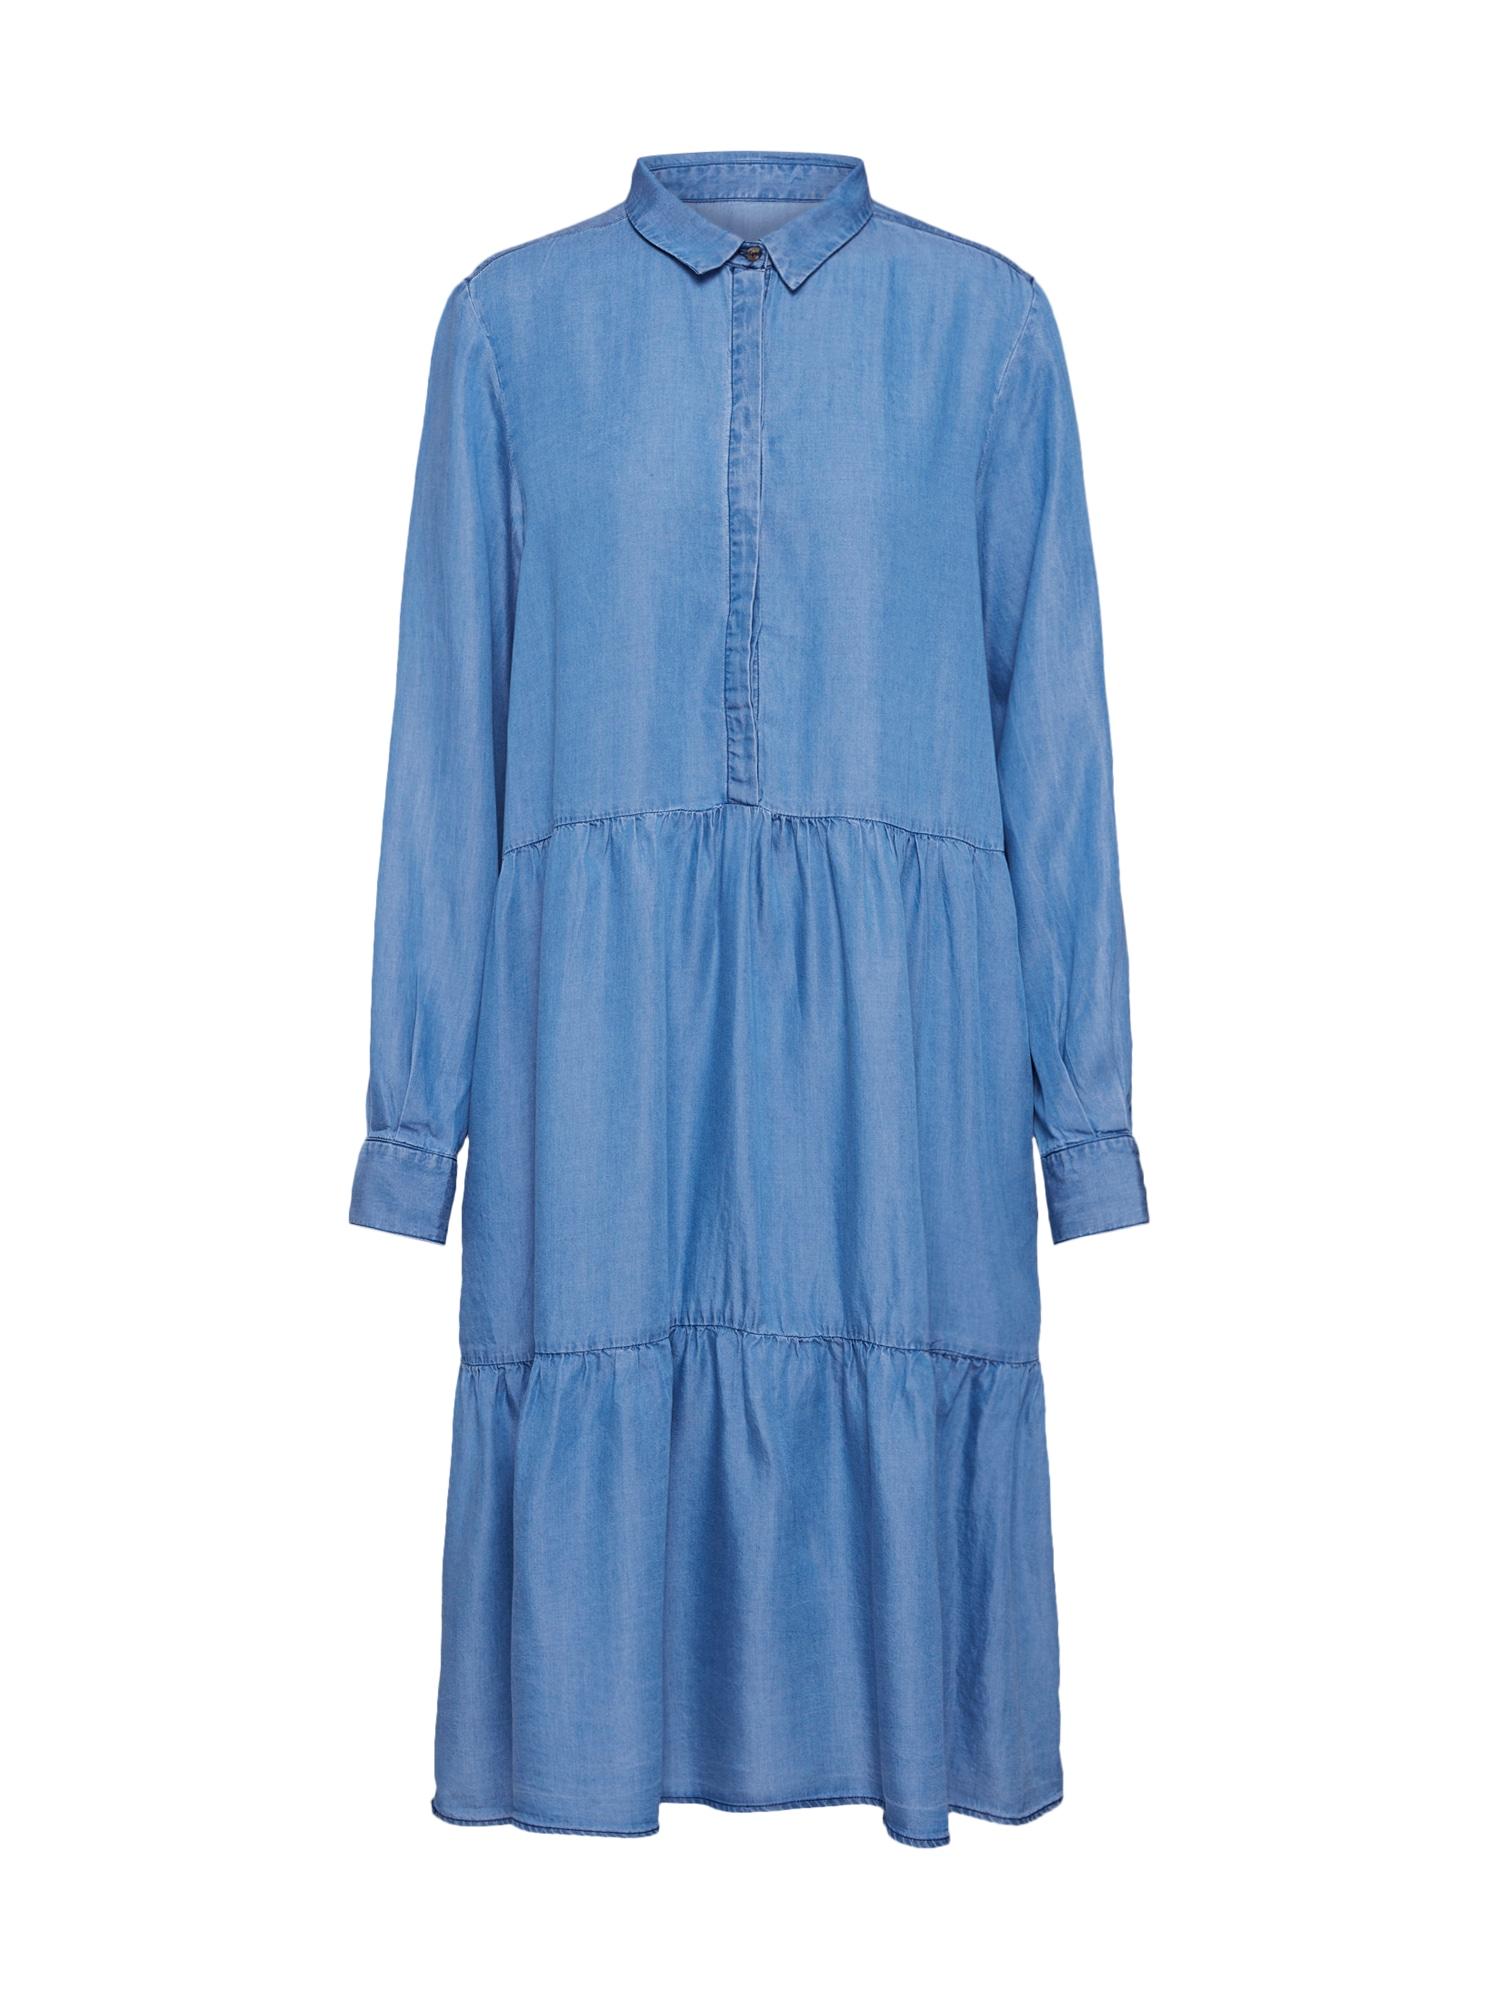 Soft Rebels Palaidinės tipo suknelė 'Moira' mėlyna